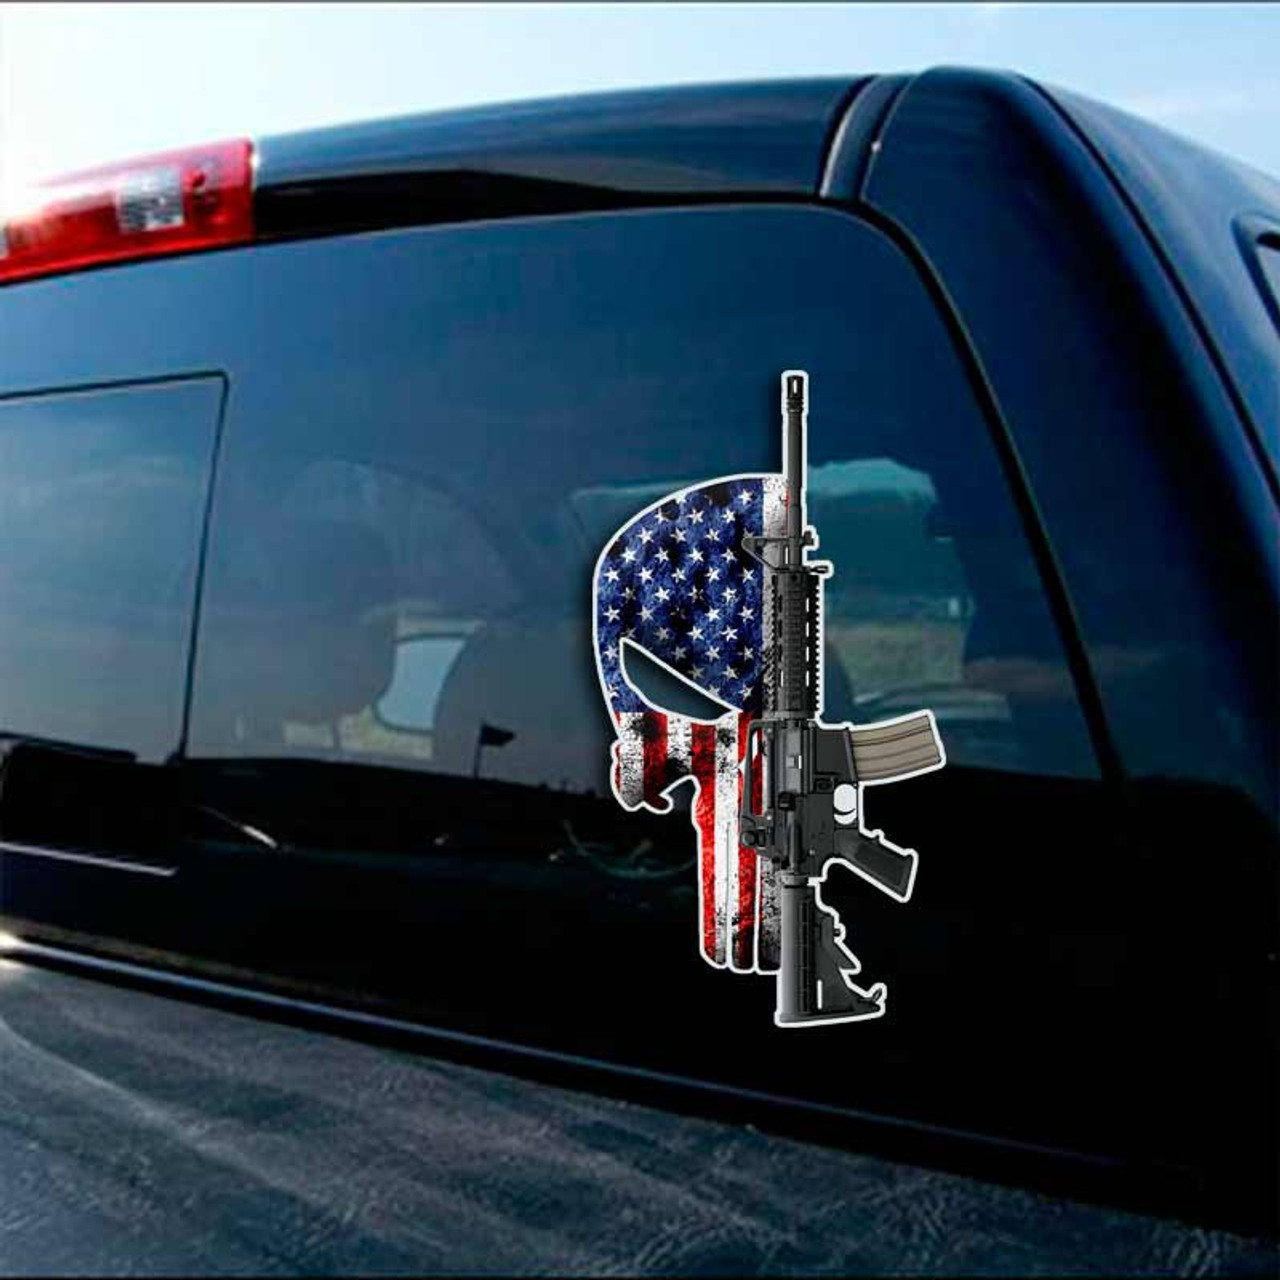 2nd Amendment Punisher Sticker Decal Security American Flag Guns Truck Car